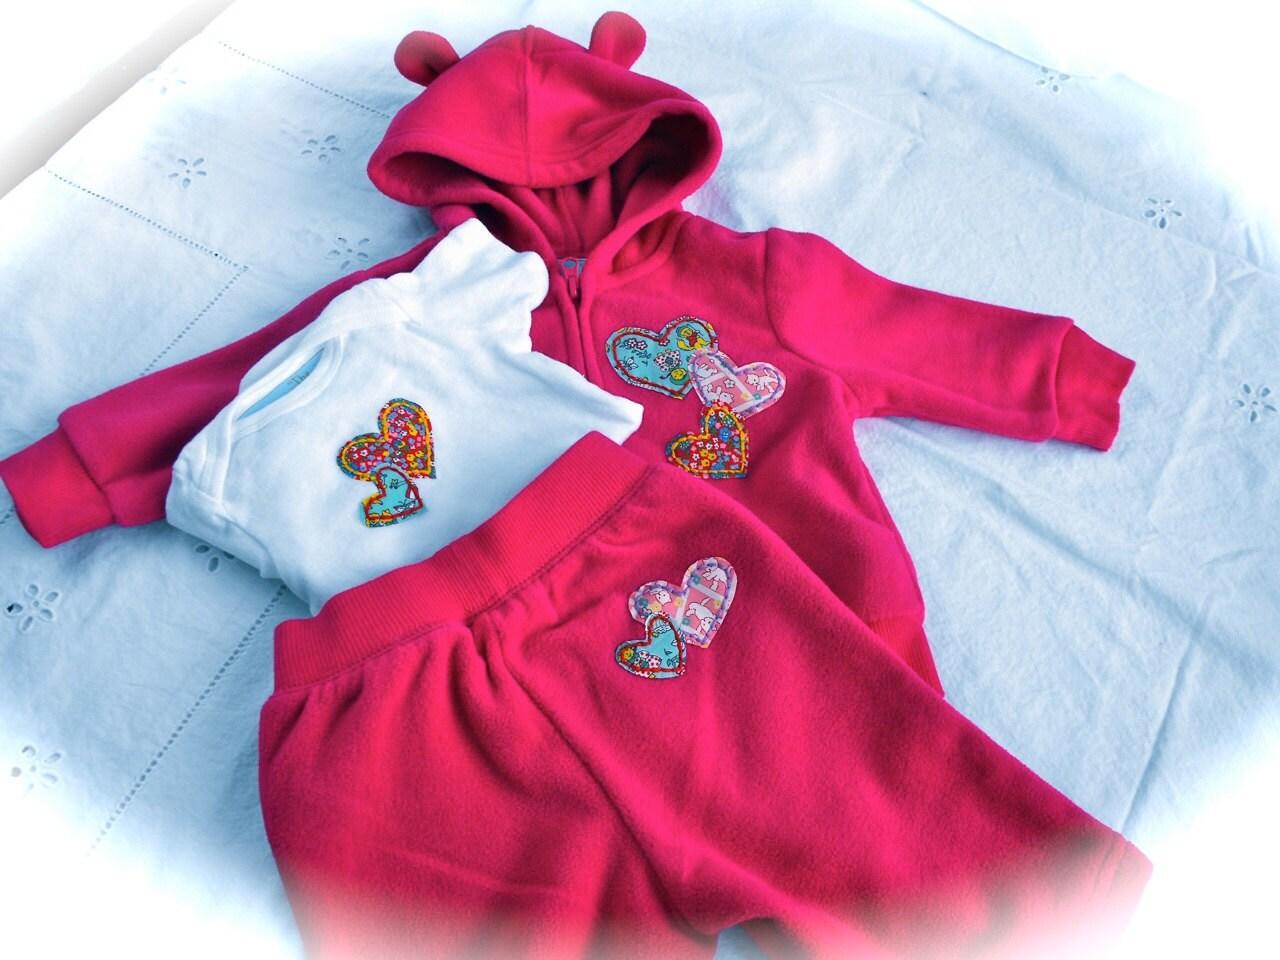 Baby Toddler Bibb Knit Playsuit Pattern, Vintage 1940s